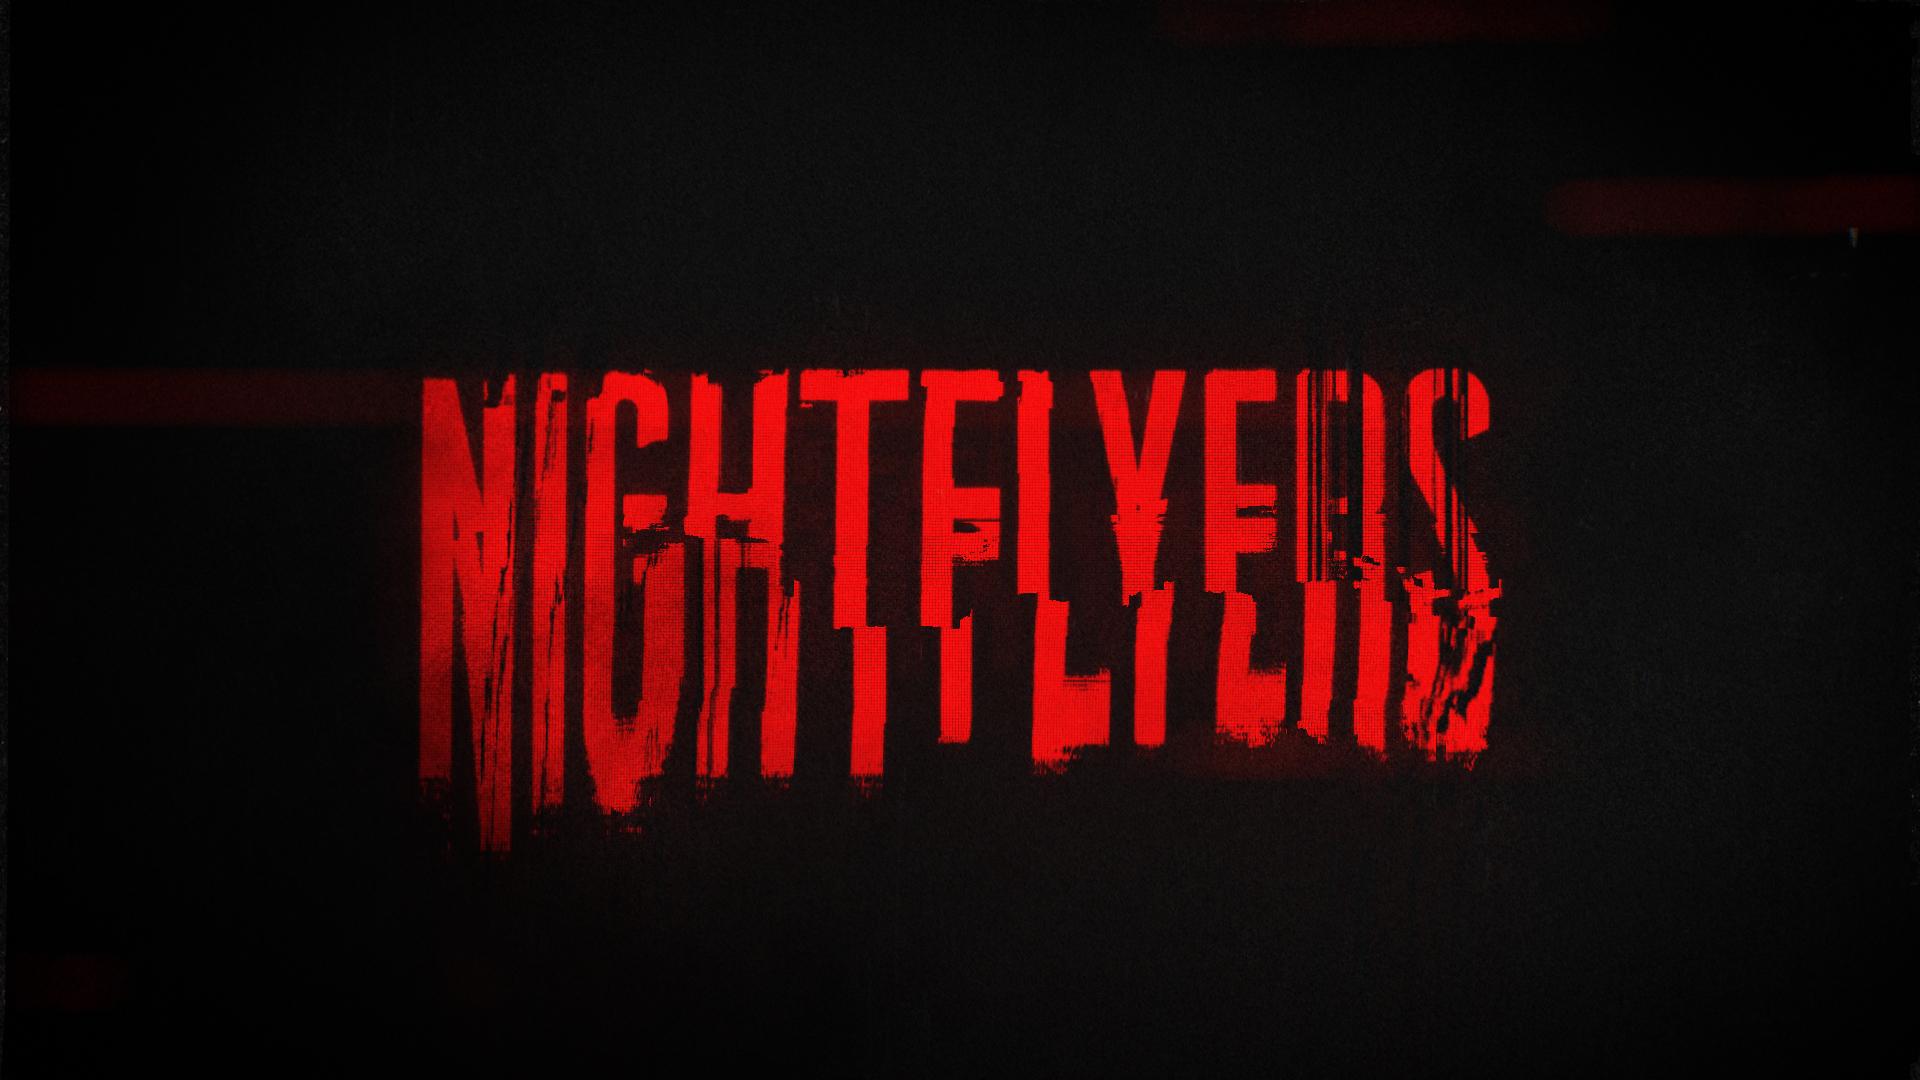 NIGHTFLYERS_PP_DESIGN_25_0000.jpg